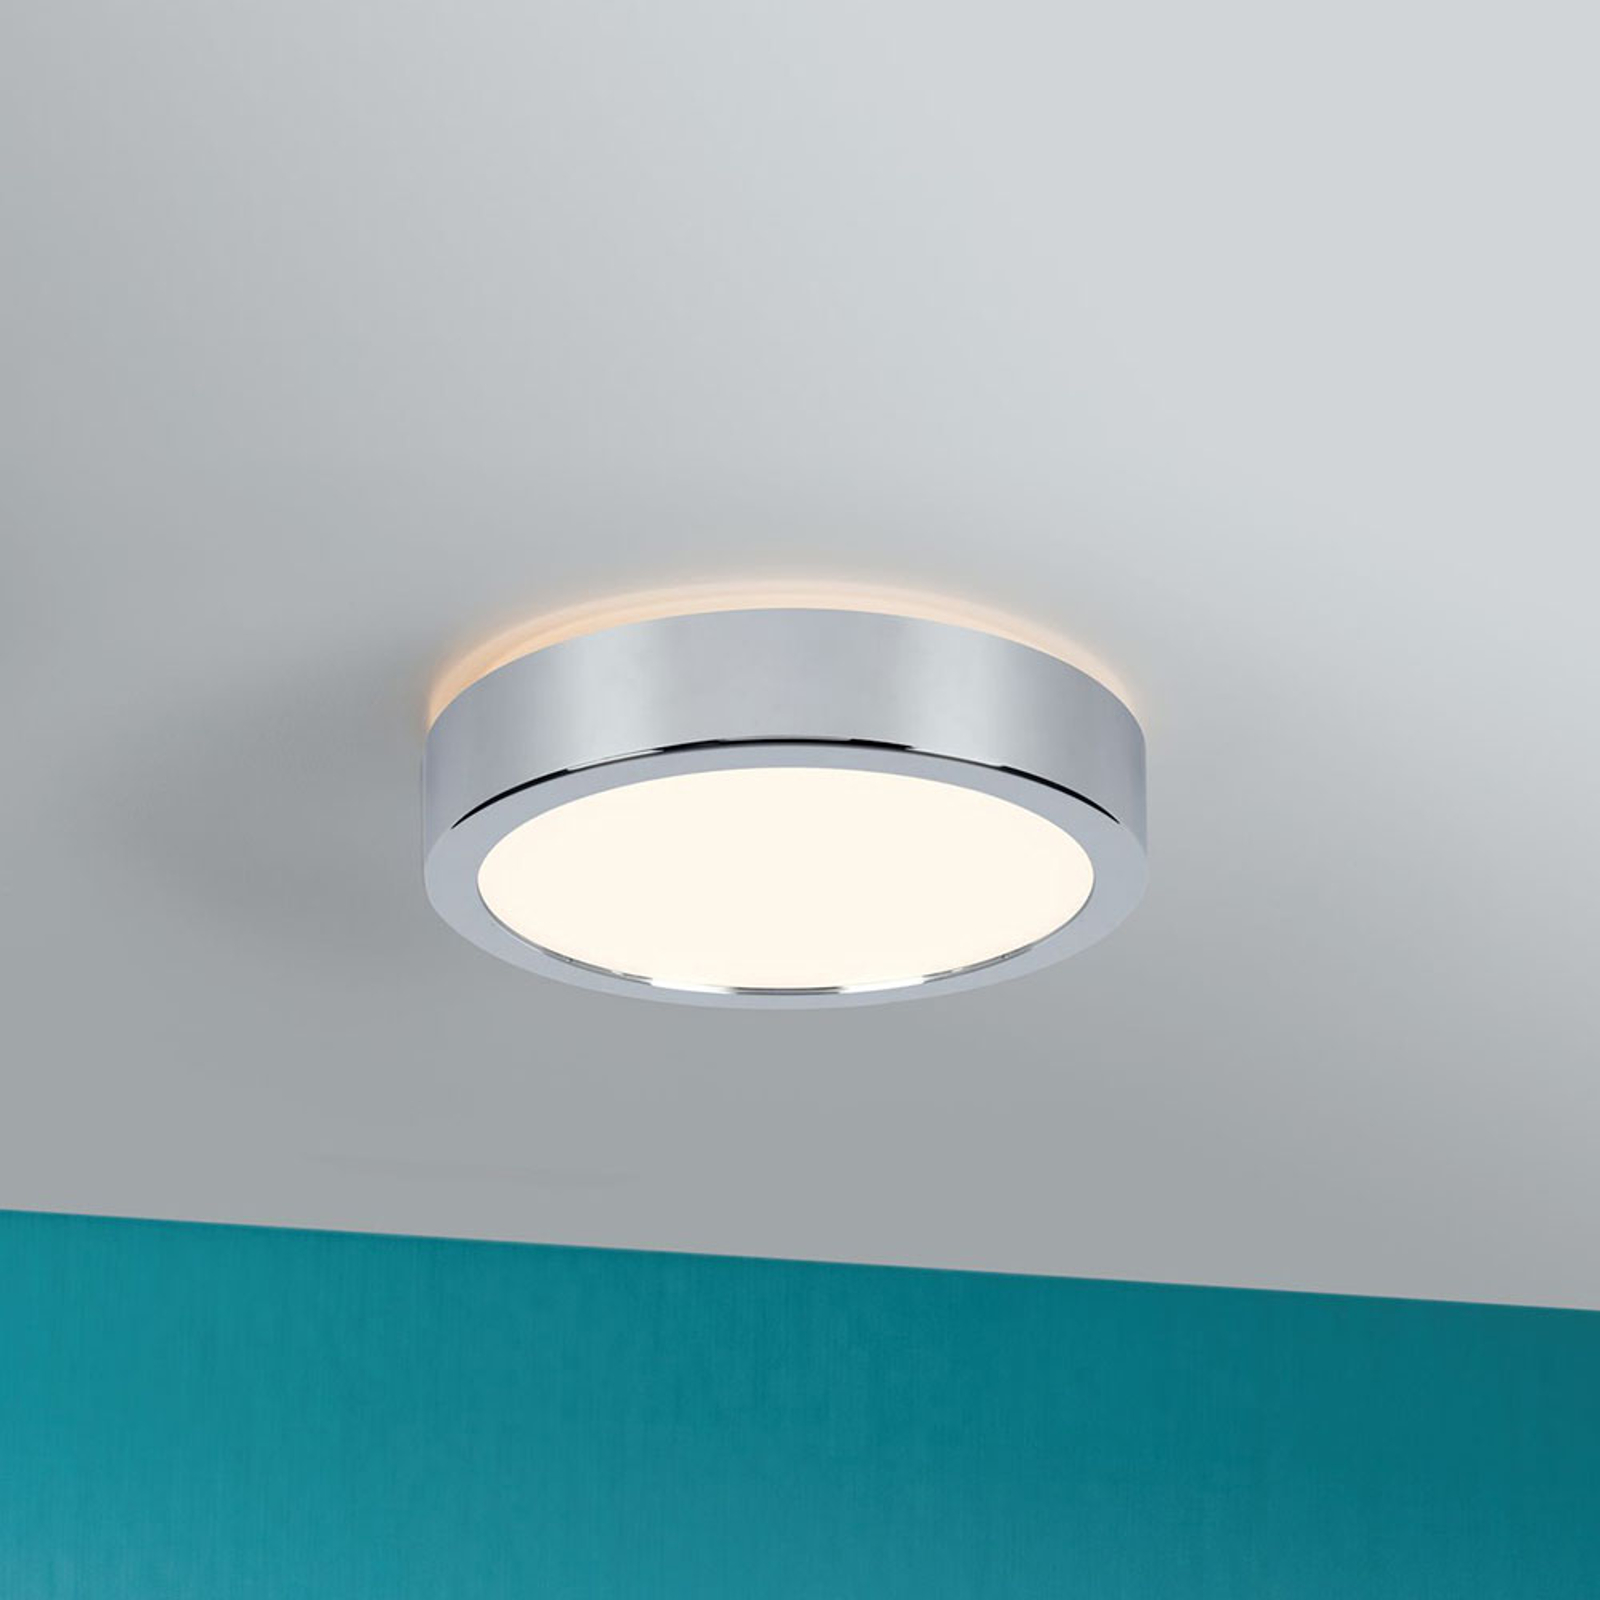 Paulmann Aviar lampa sufitowa LED Ø 22cm 3000K